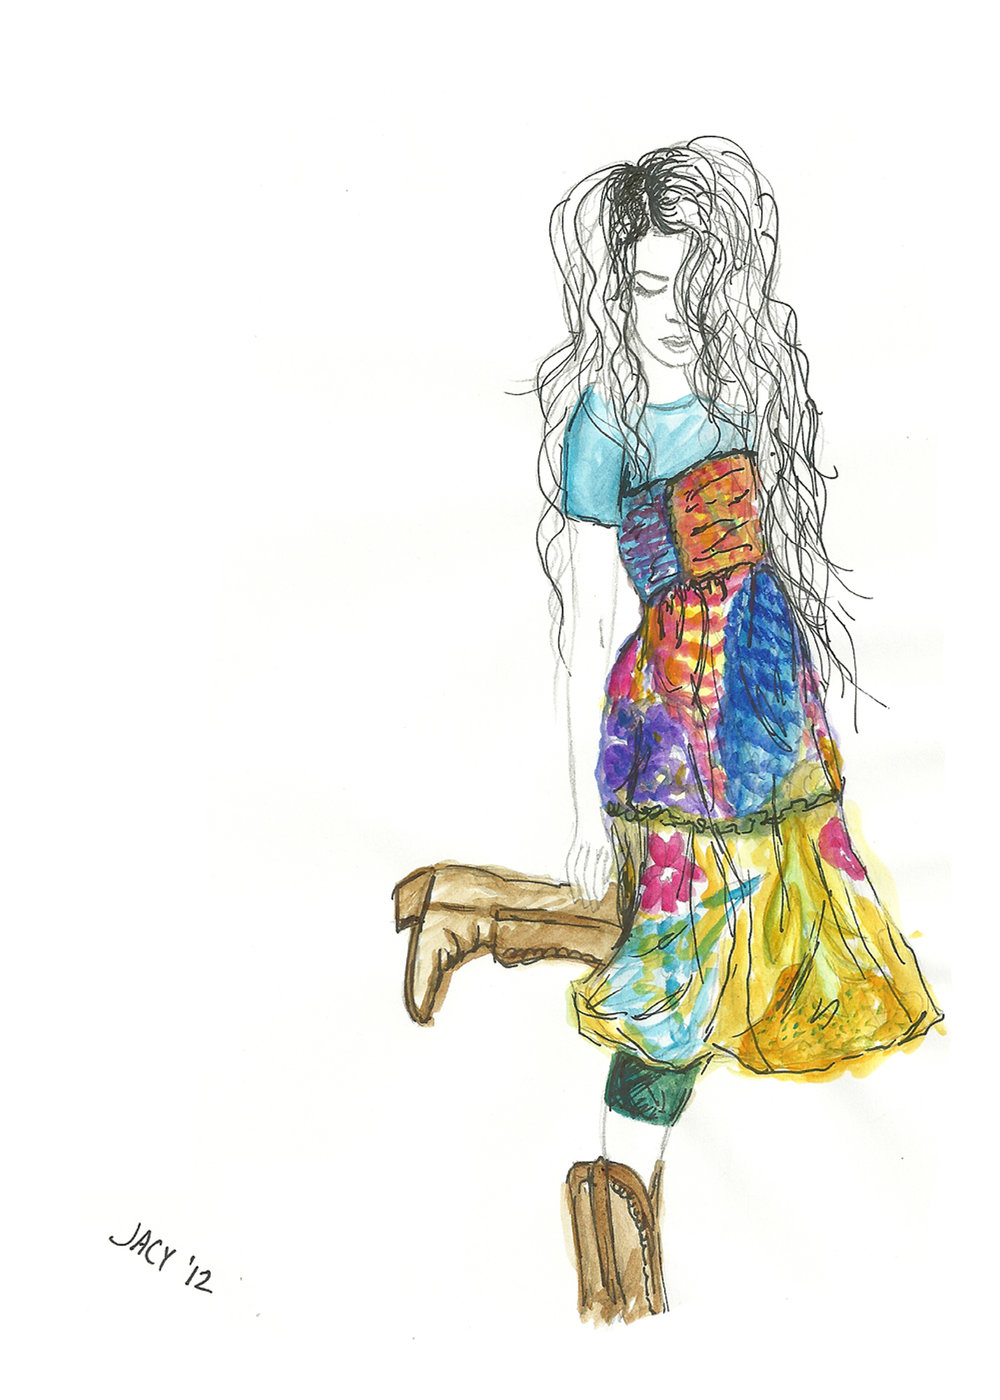 Vintage Floral Dress & Cowboy Boots- 5x7.jpg